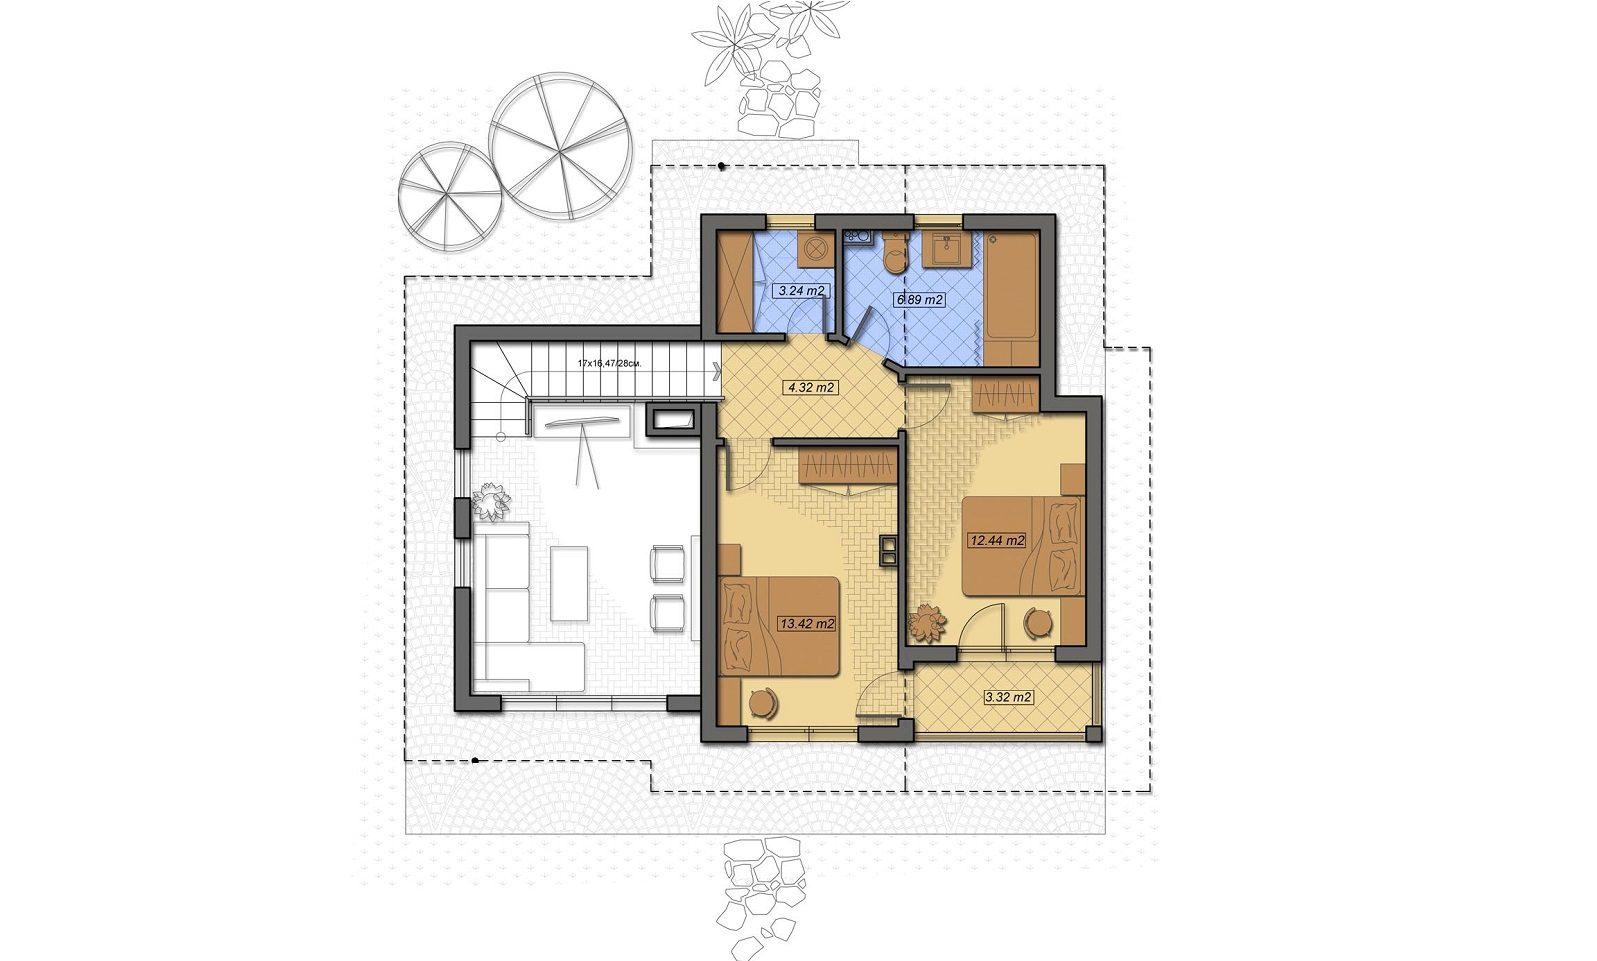 Casa din Povesti plan etaj - Cartierul Buna Ziua Tartasesti nord vest Bucuresti